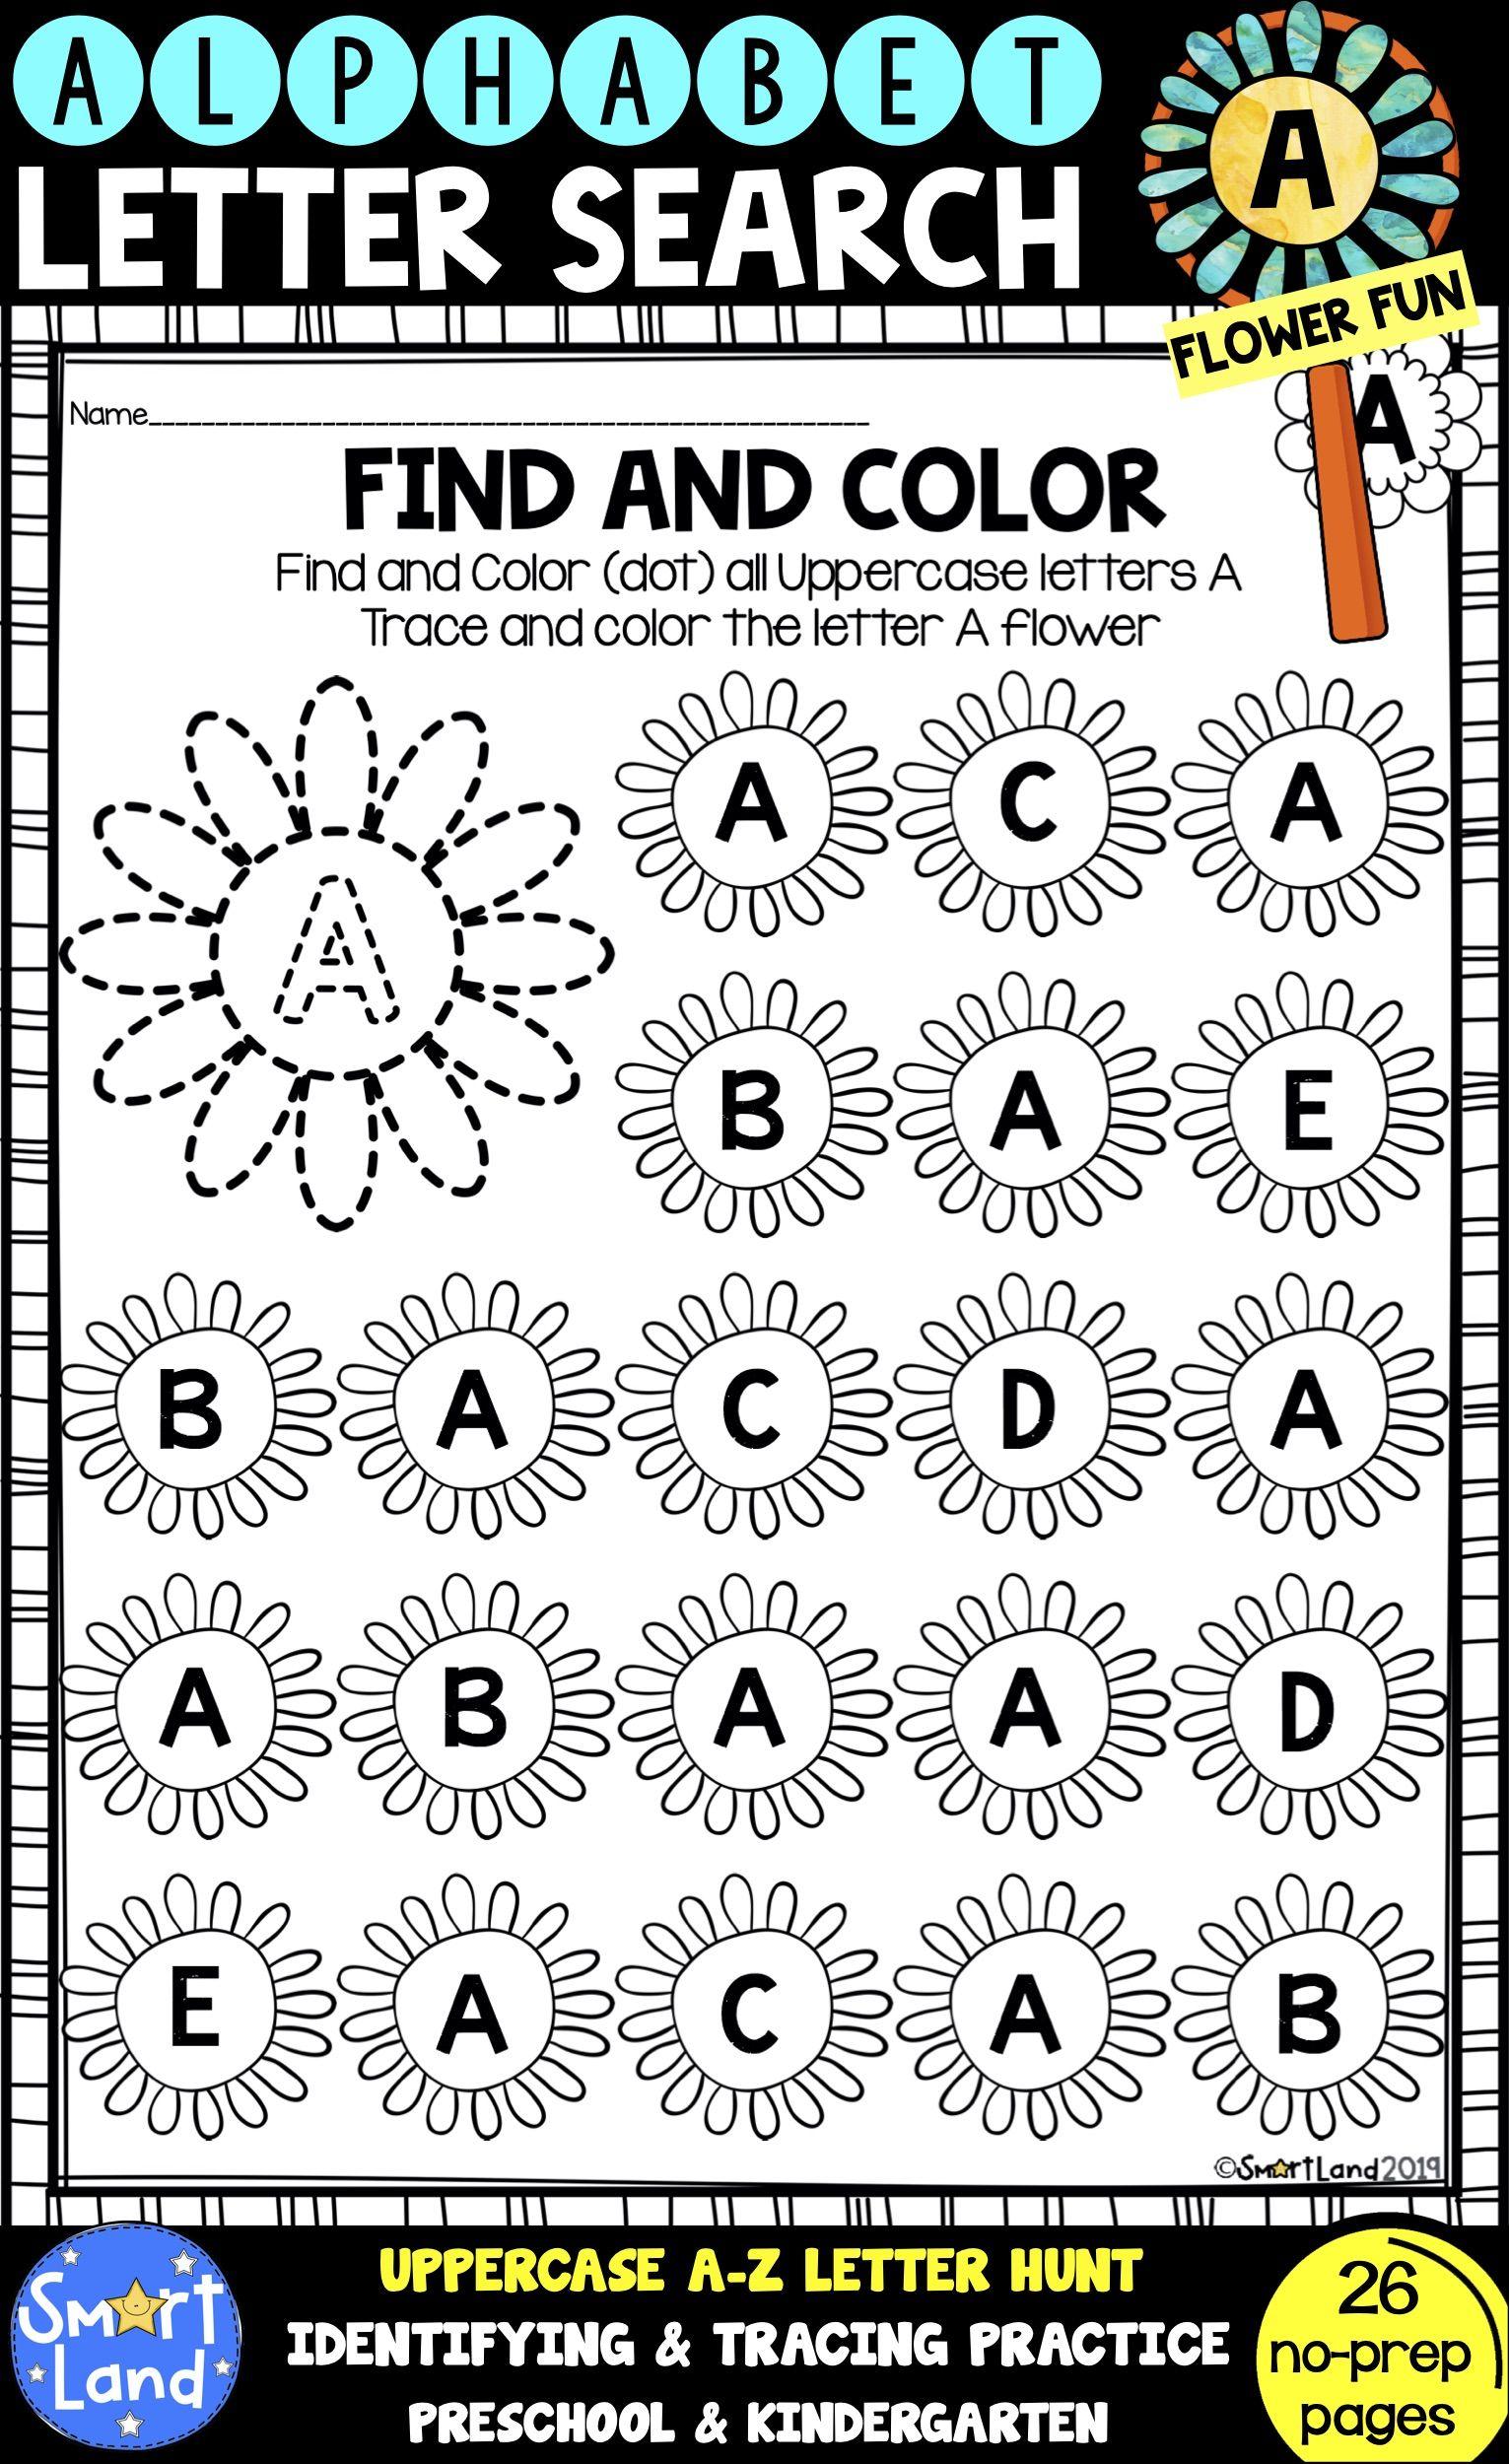 Alphabet Practice Letter Search Flowers Alphabet Practice Lettering Alphabet Handwriting Practice